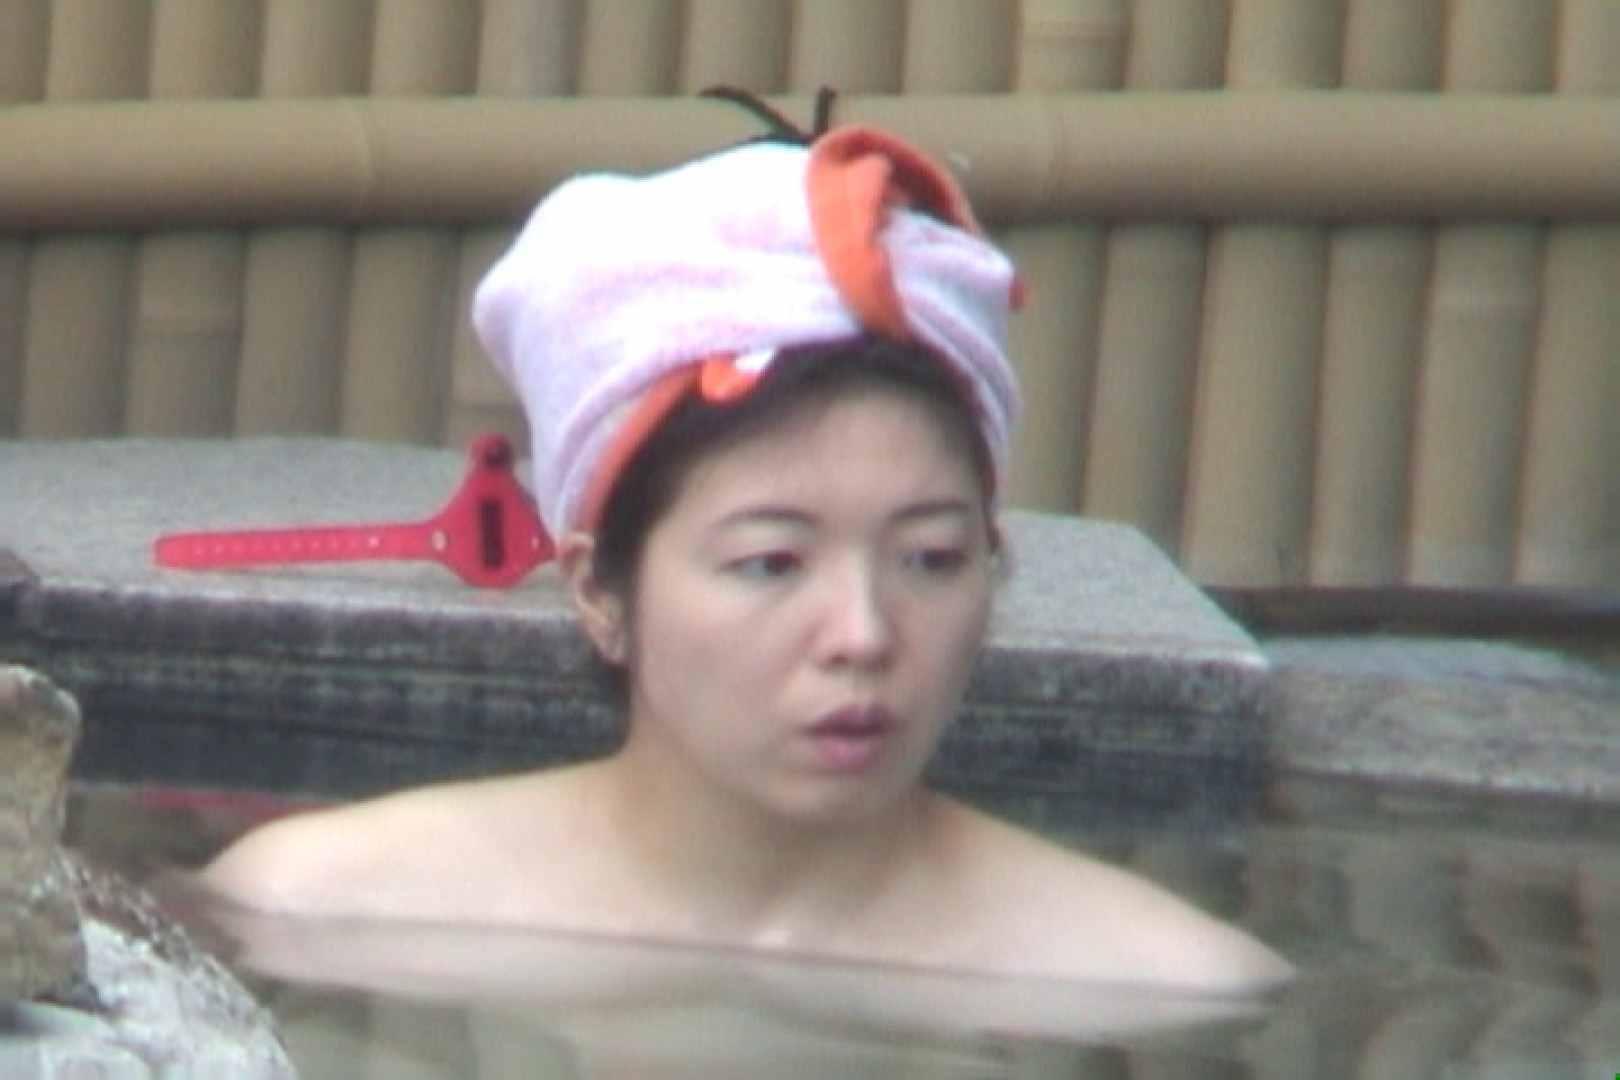 Aquaな露天風呂Vol.573 0  85連発 85